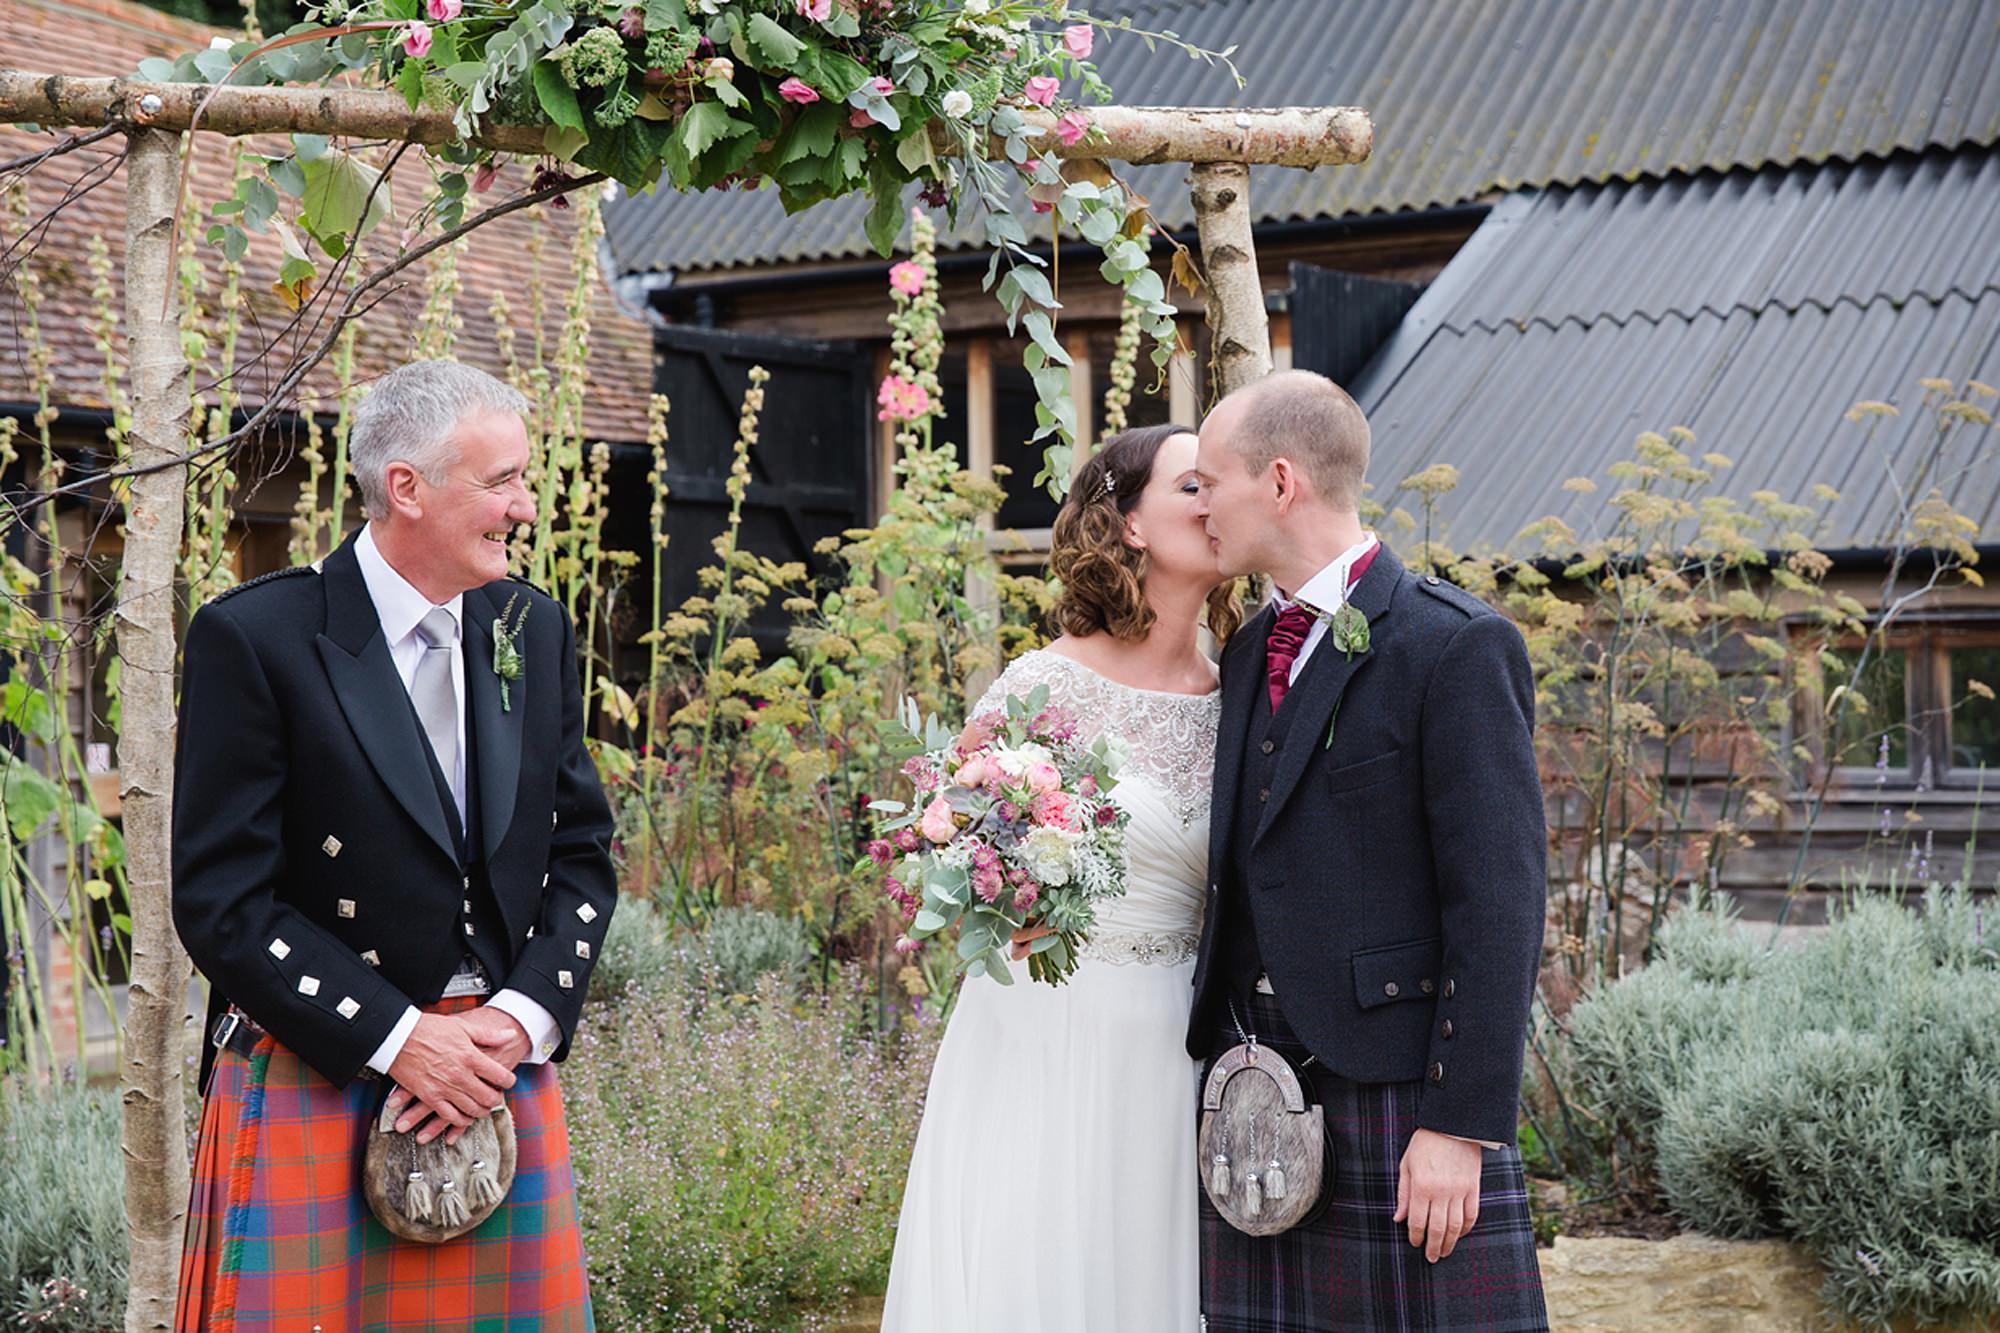 outdoor humanist wedding photography groom kisses bride